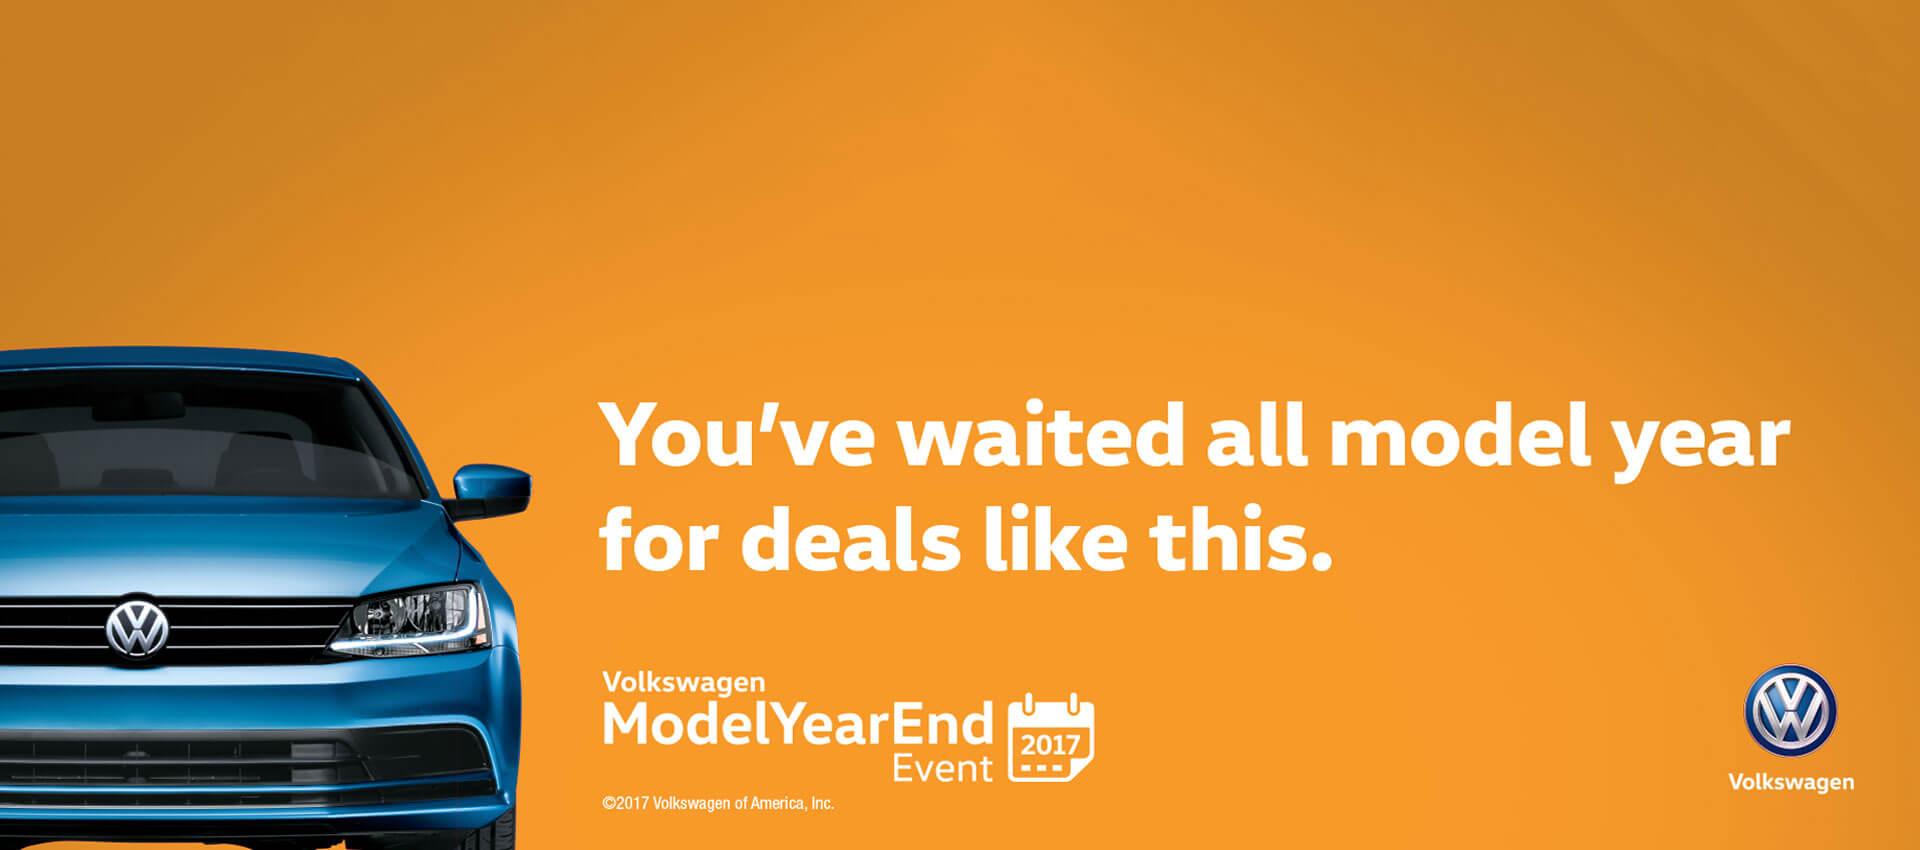 Model Year End